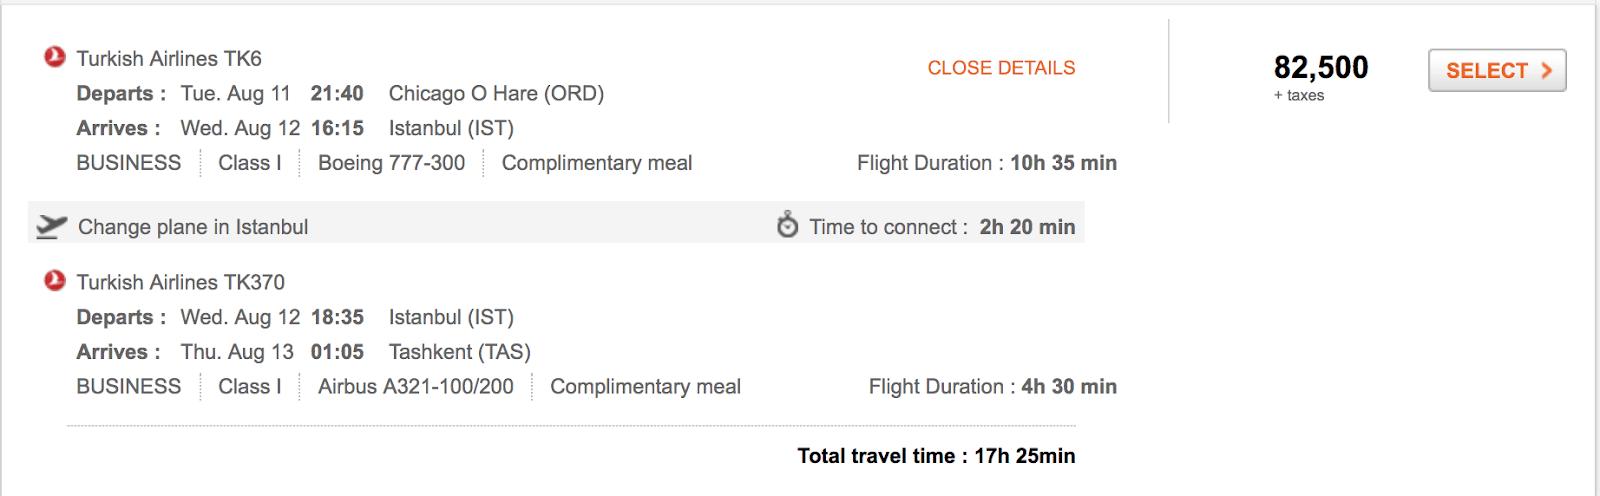 02. U.S. to Tashkent with Aeroplan